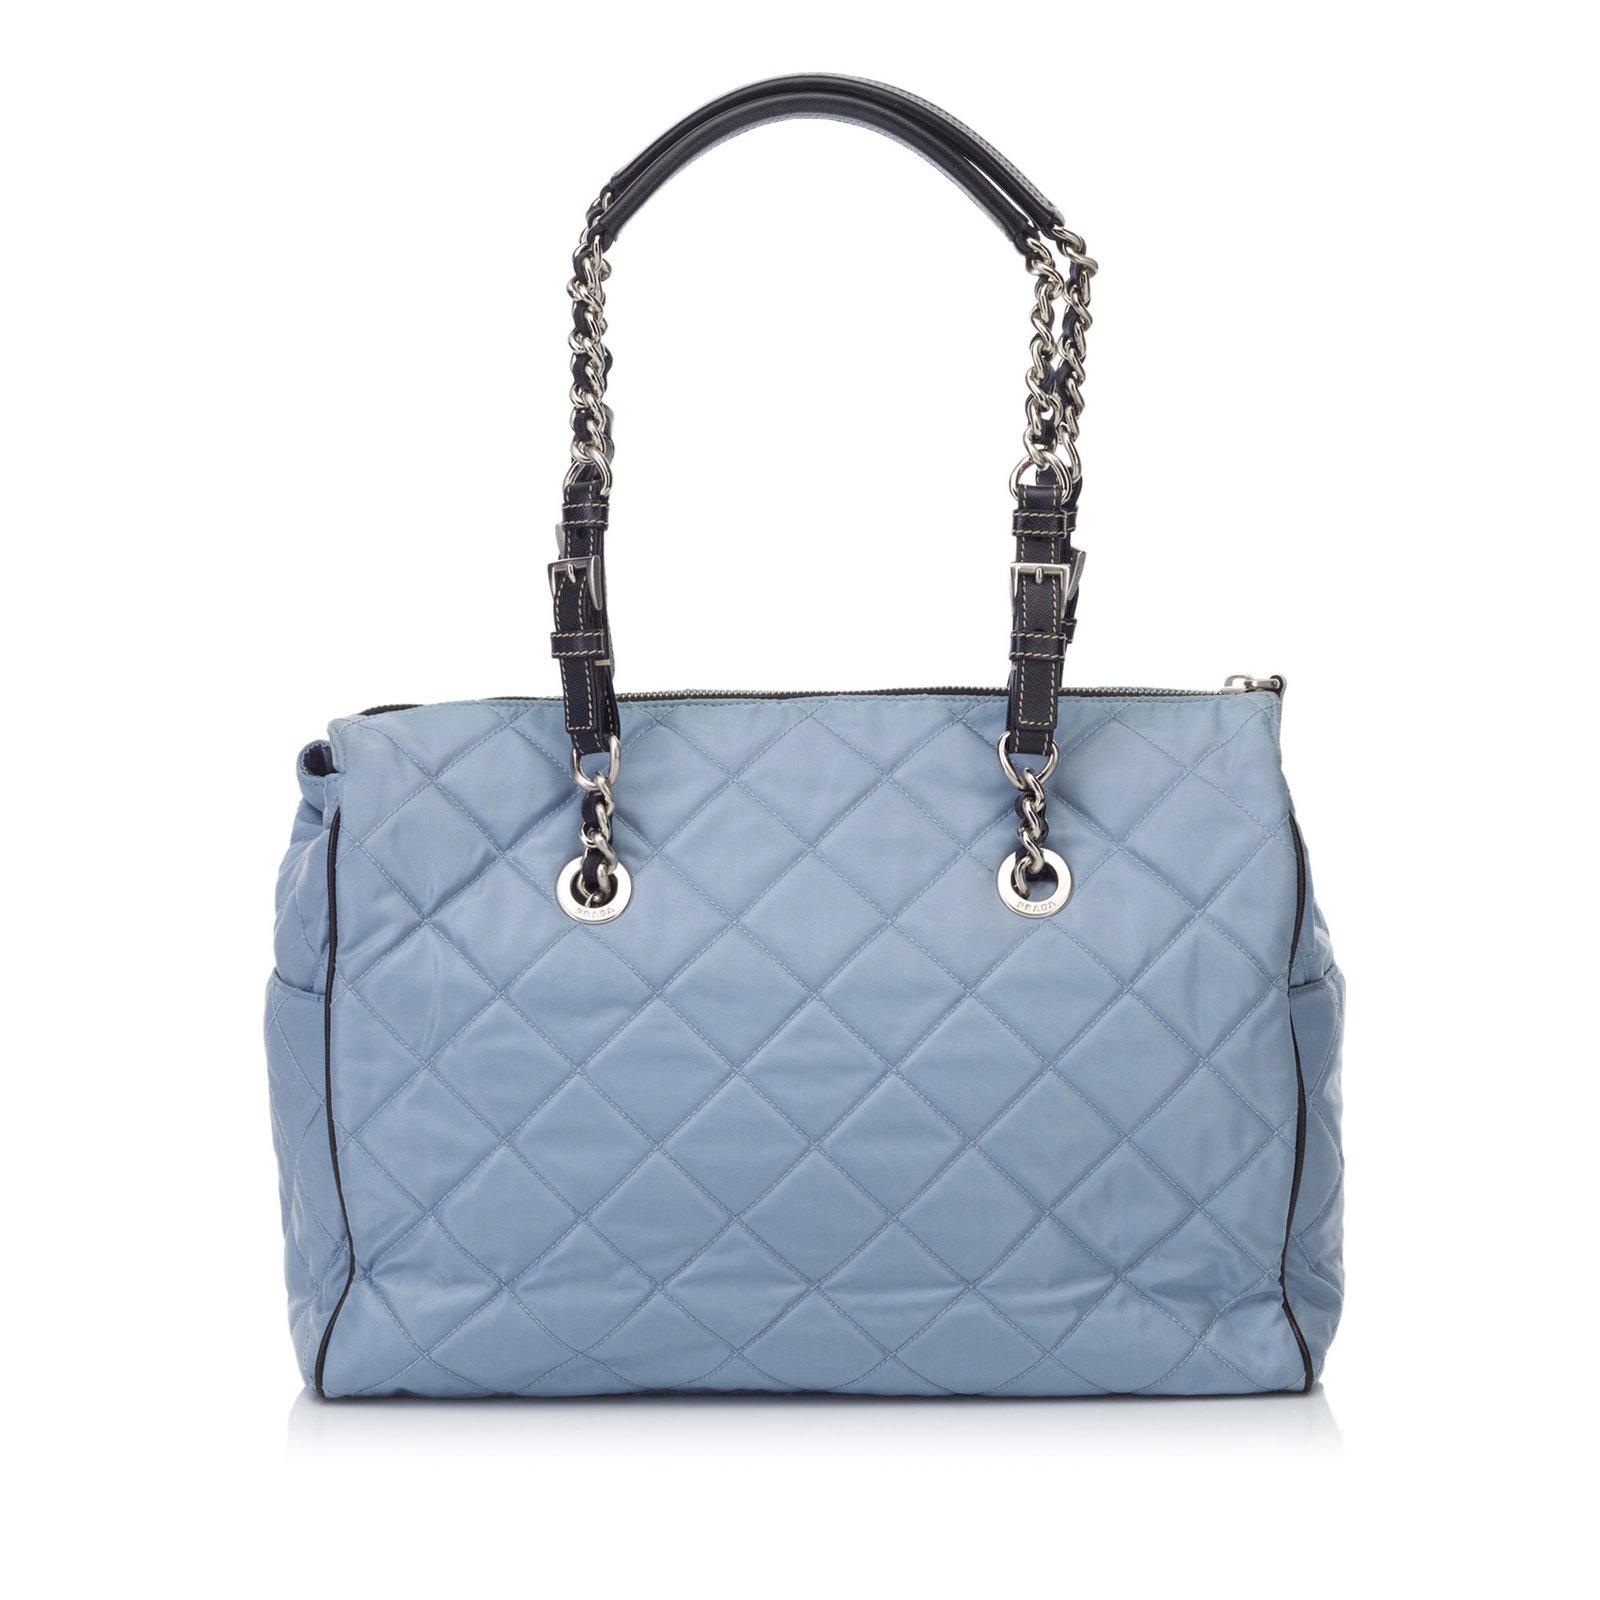 Prada Quilted Nylon Shoulder Bag Handbags Leather 5b783c2589a68